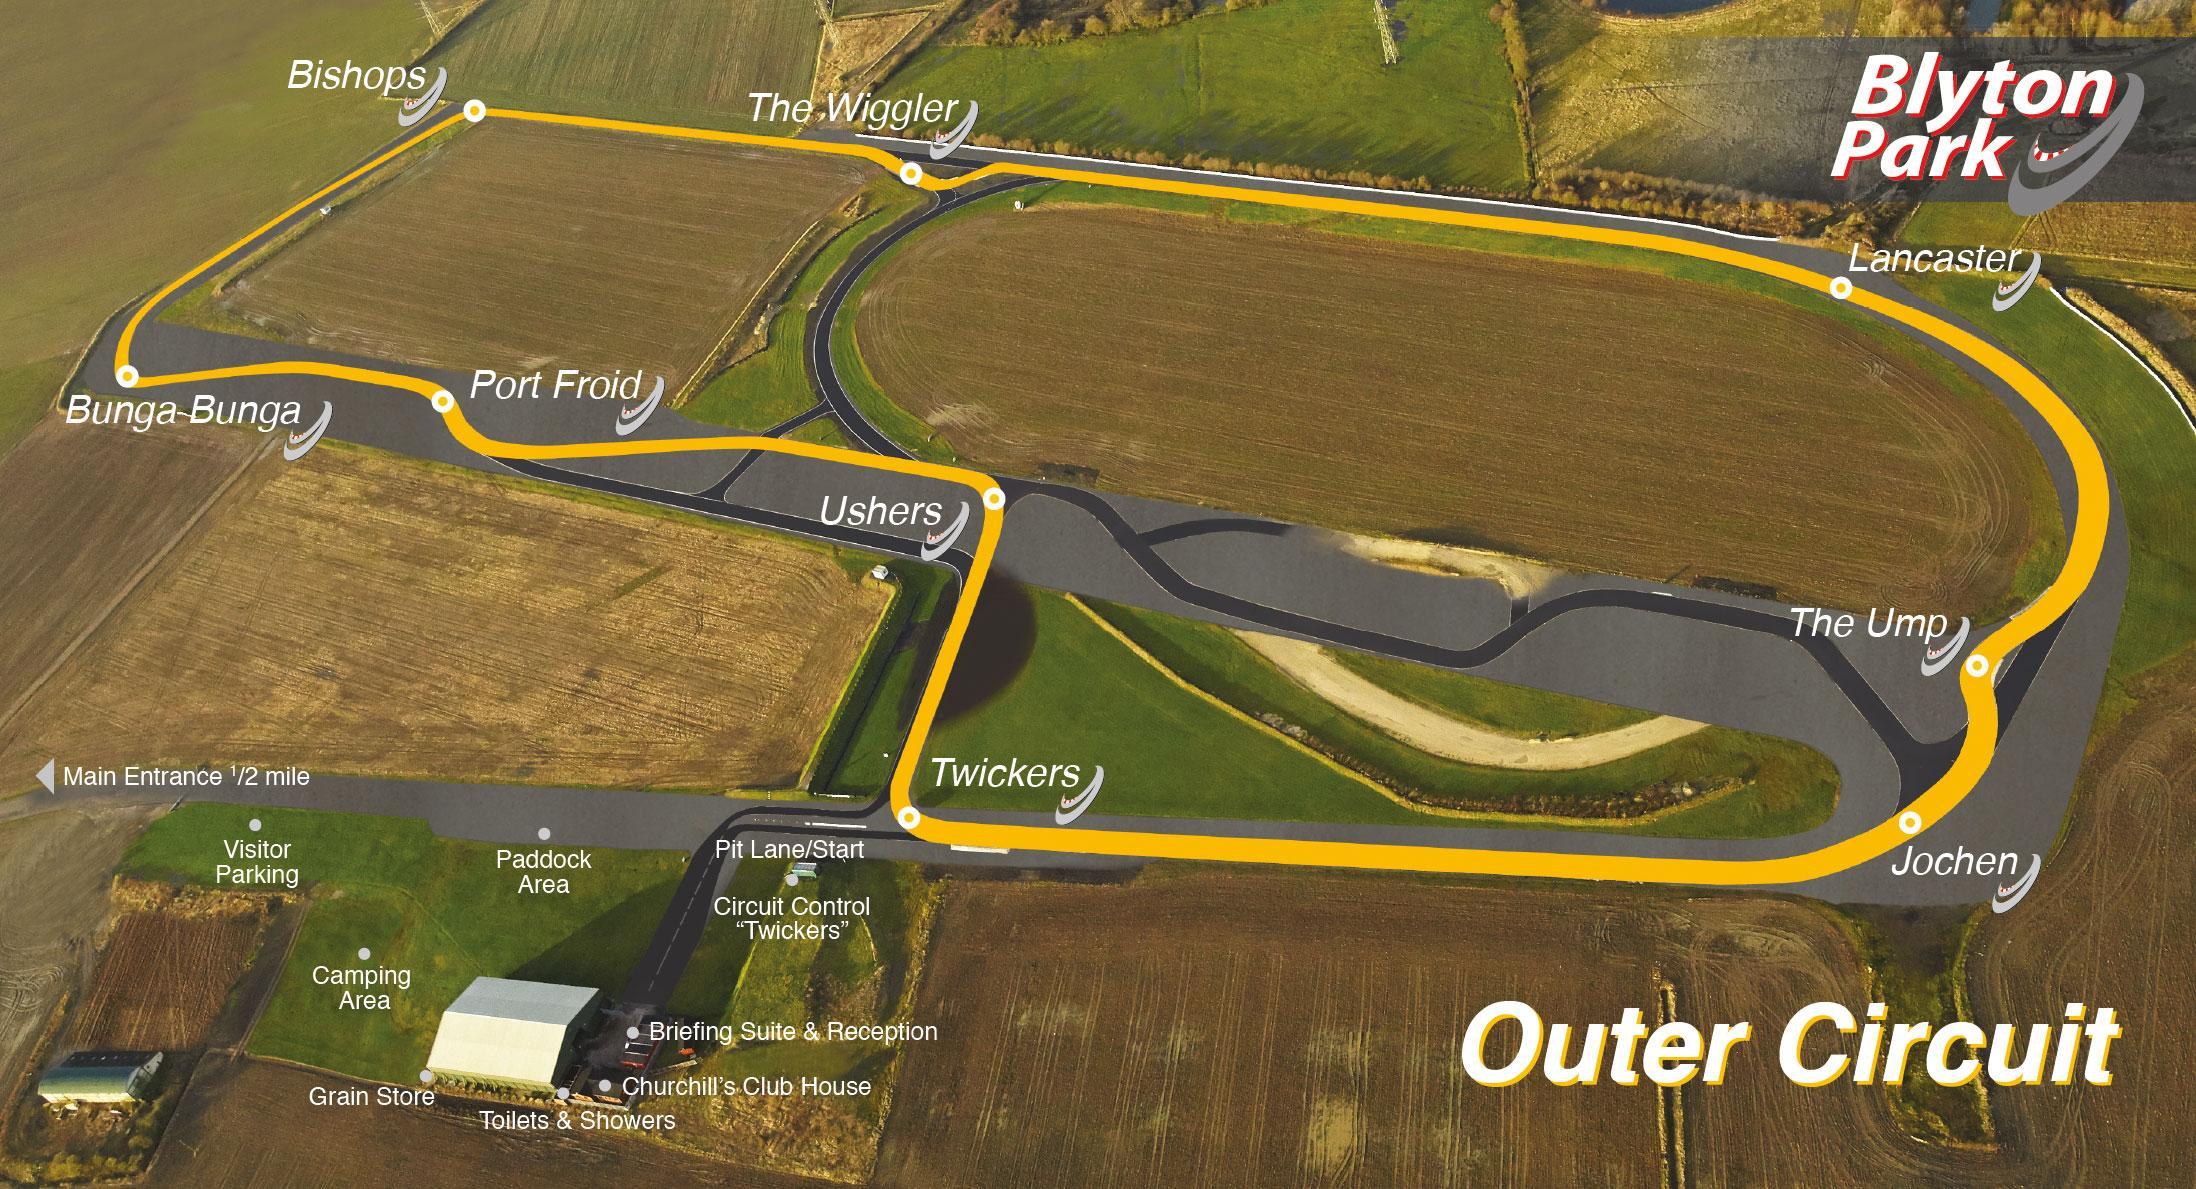 Porsche 911 Turbo >> Blyton Park Outer Circuit lap times - FastestLaps.com